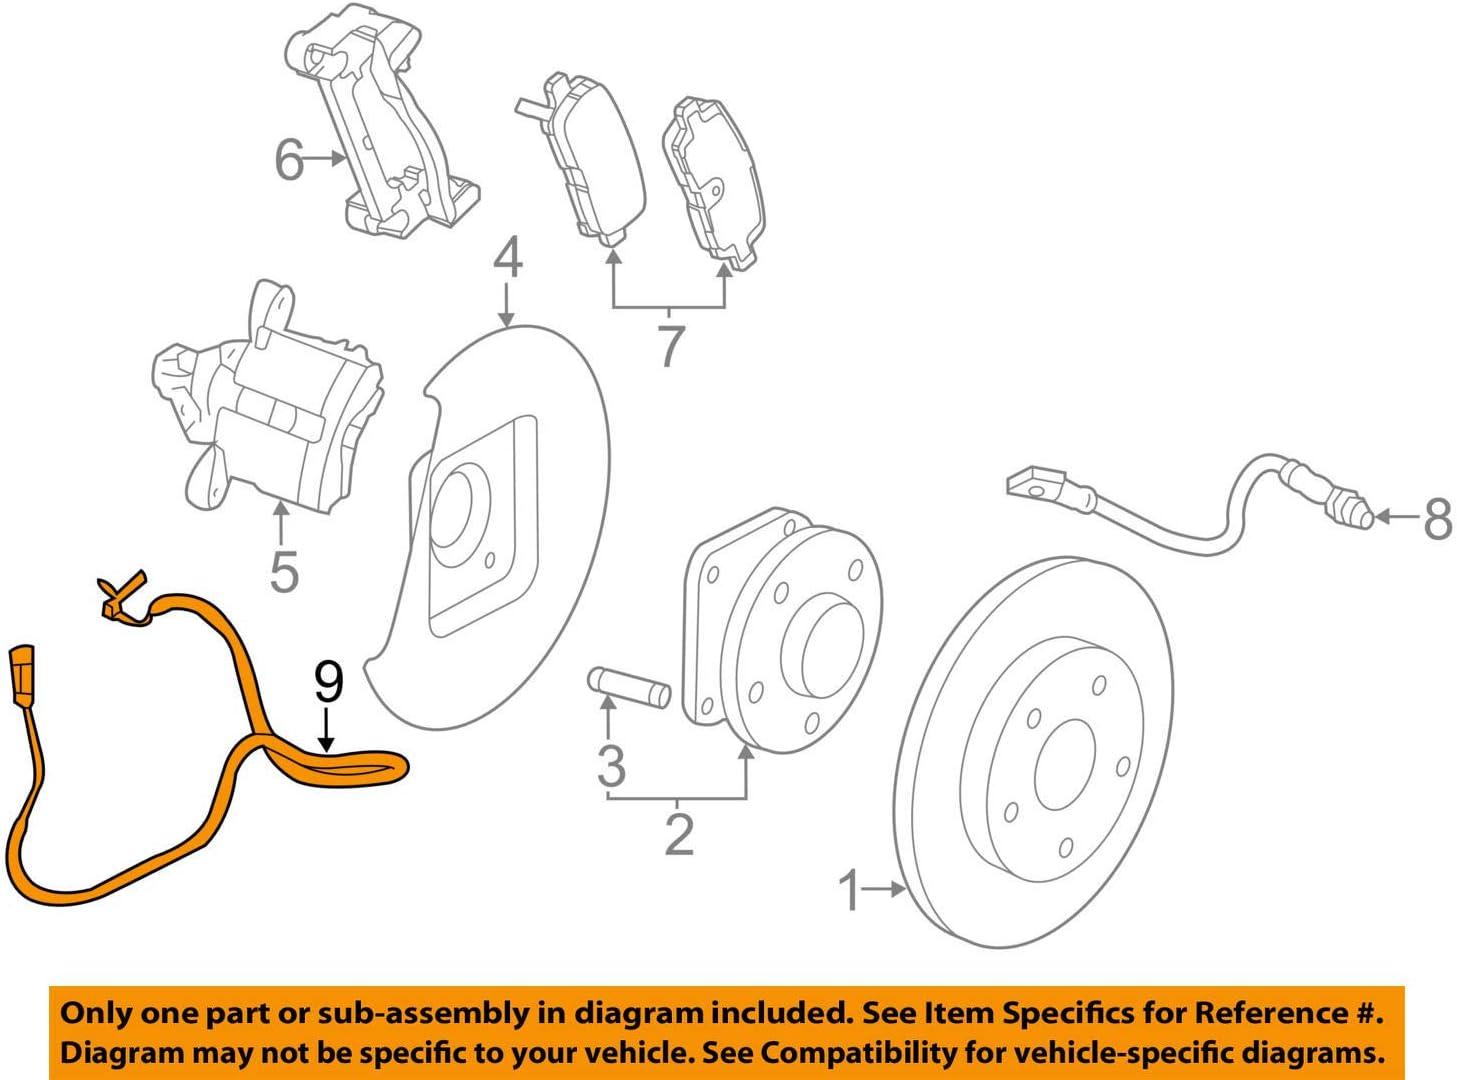 Amazon.com: General Motors 22785582, ABS Wheel Speed Sensor: AutomotiveAmazon.com